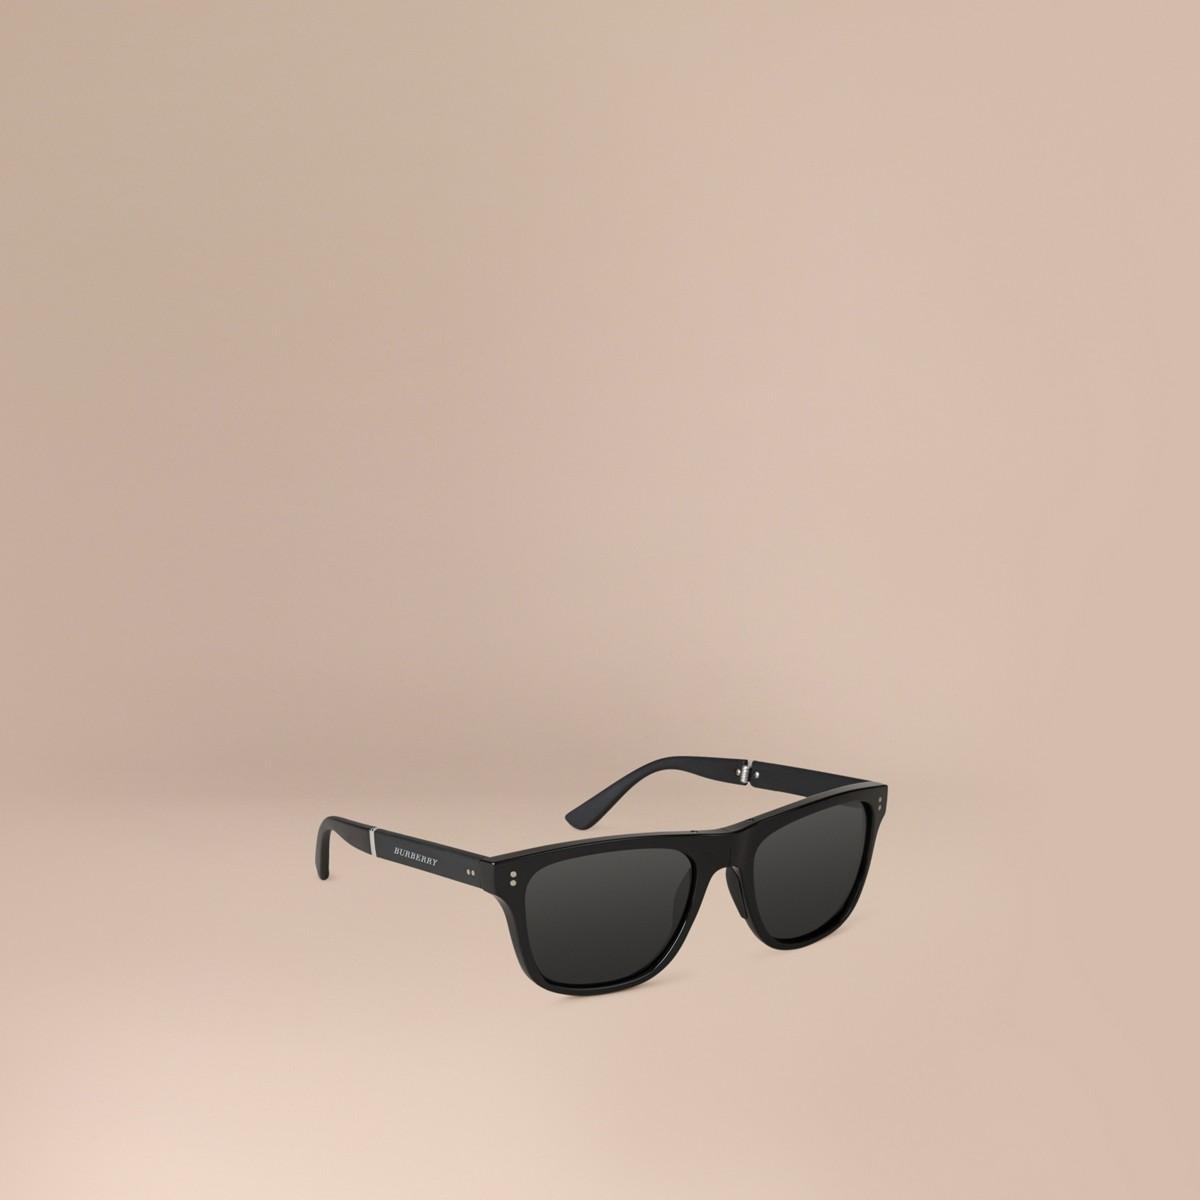 2aaad142d9db Buy burberry sunglasses & eyewear for men - Best men's burberry ...